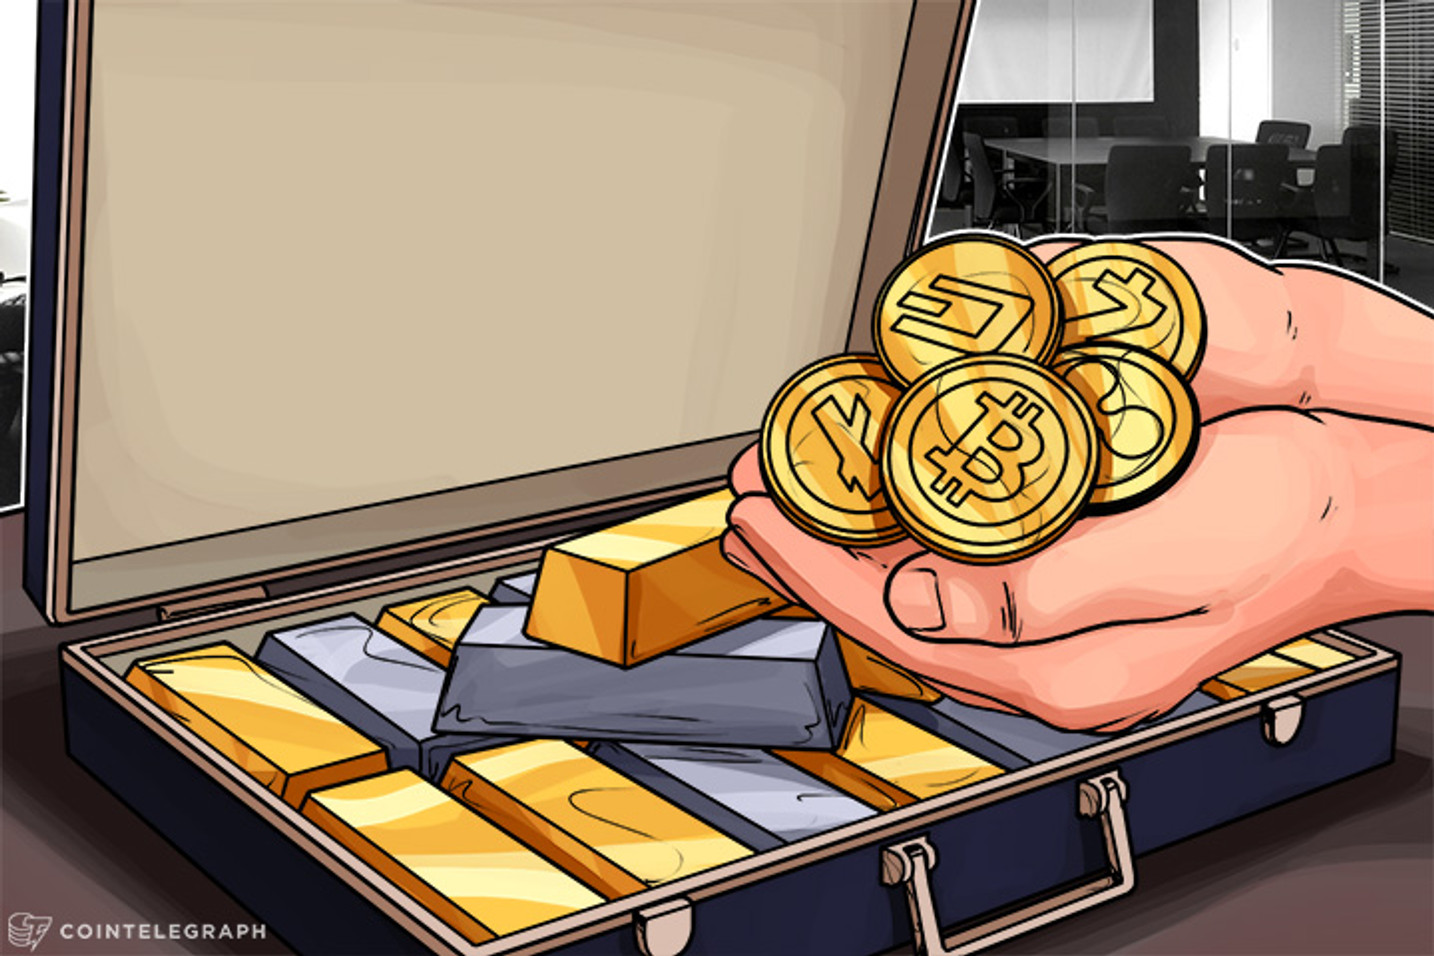 Why Bitcoin, Precious Metals Should Be Partners in Crisis Portfolio: Opinion